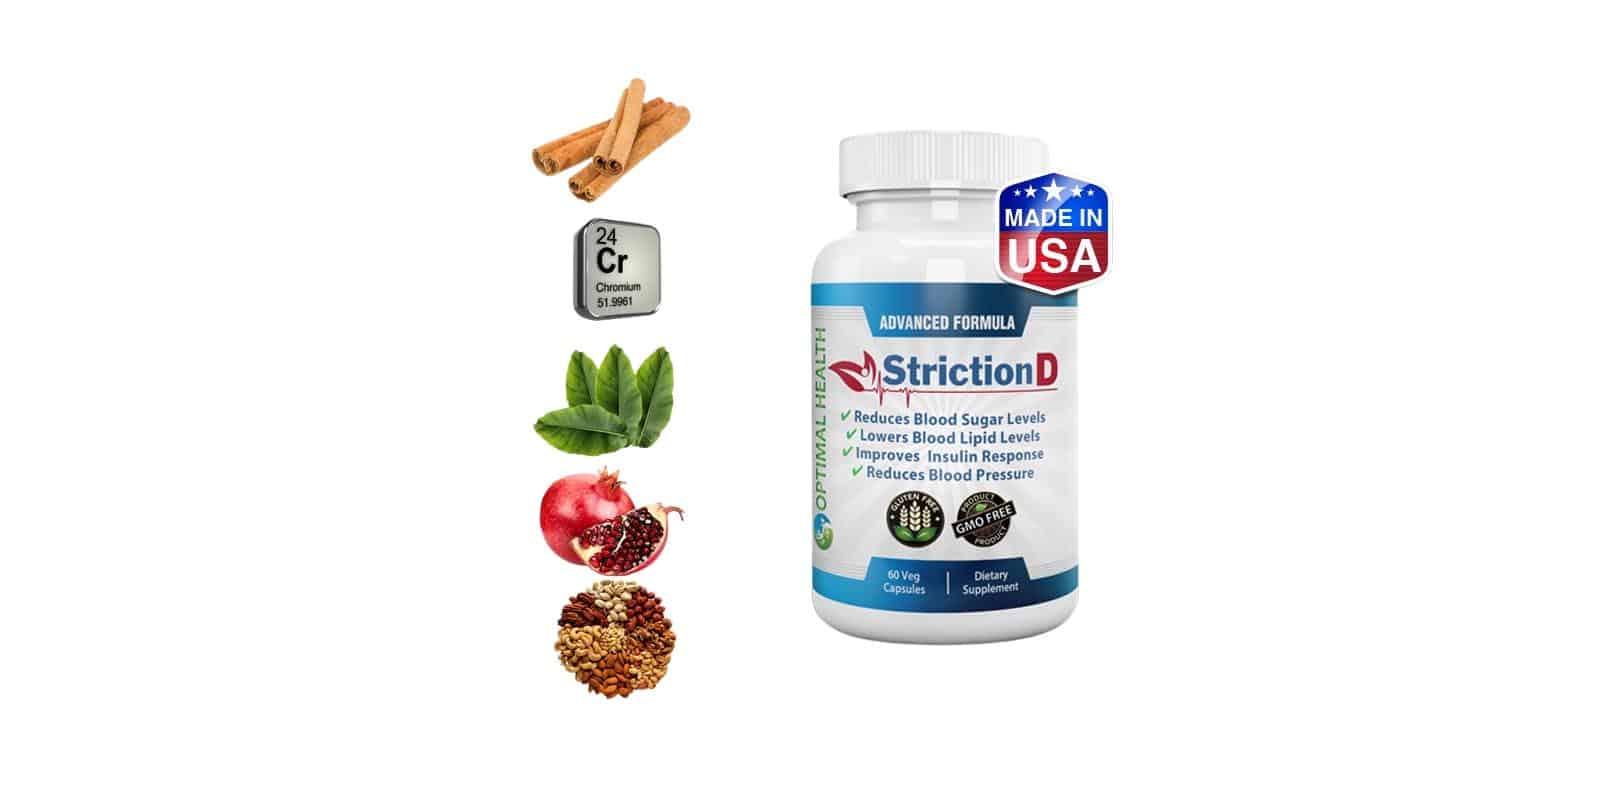 StrictionD Ingredients